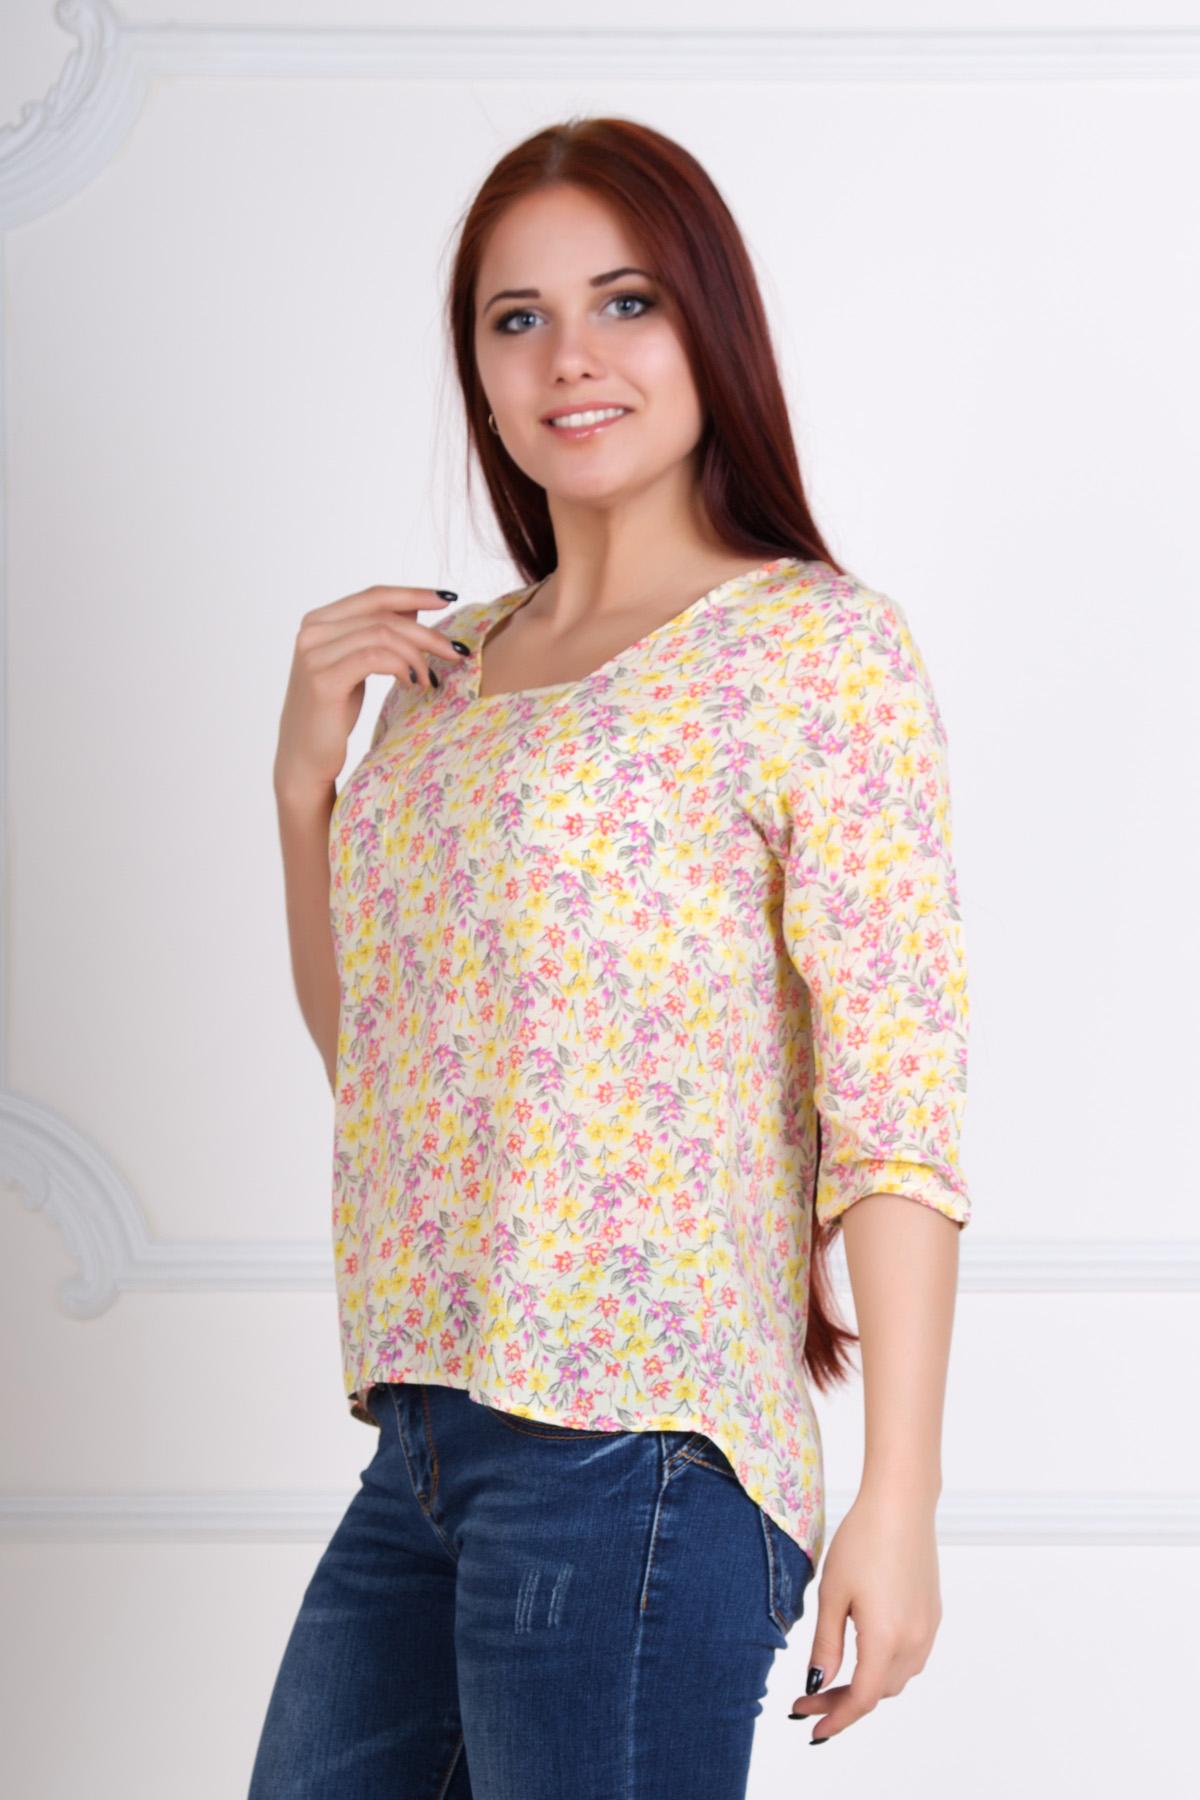 Жен. блуза Мария Желтый р. 54Распродажа<br>Обхват груди:108 см<br>Обхват талии:88 см<br>Обхват бедер:116 см<br>Длина по спинке:64 см<br>Рост:167 см<br><br>Тип: Жен. блуза<br>Размер: 54<br>Материал: Штапель